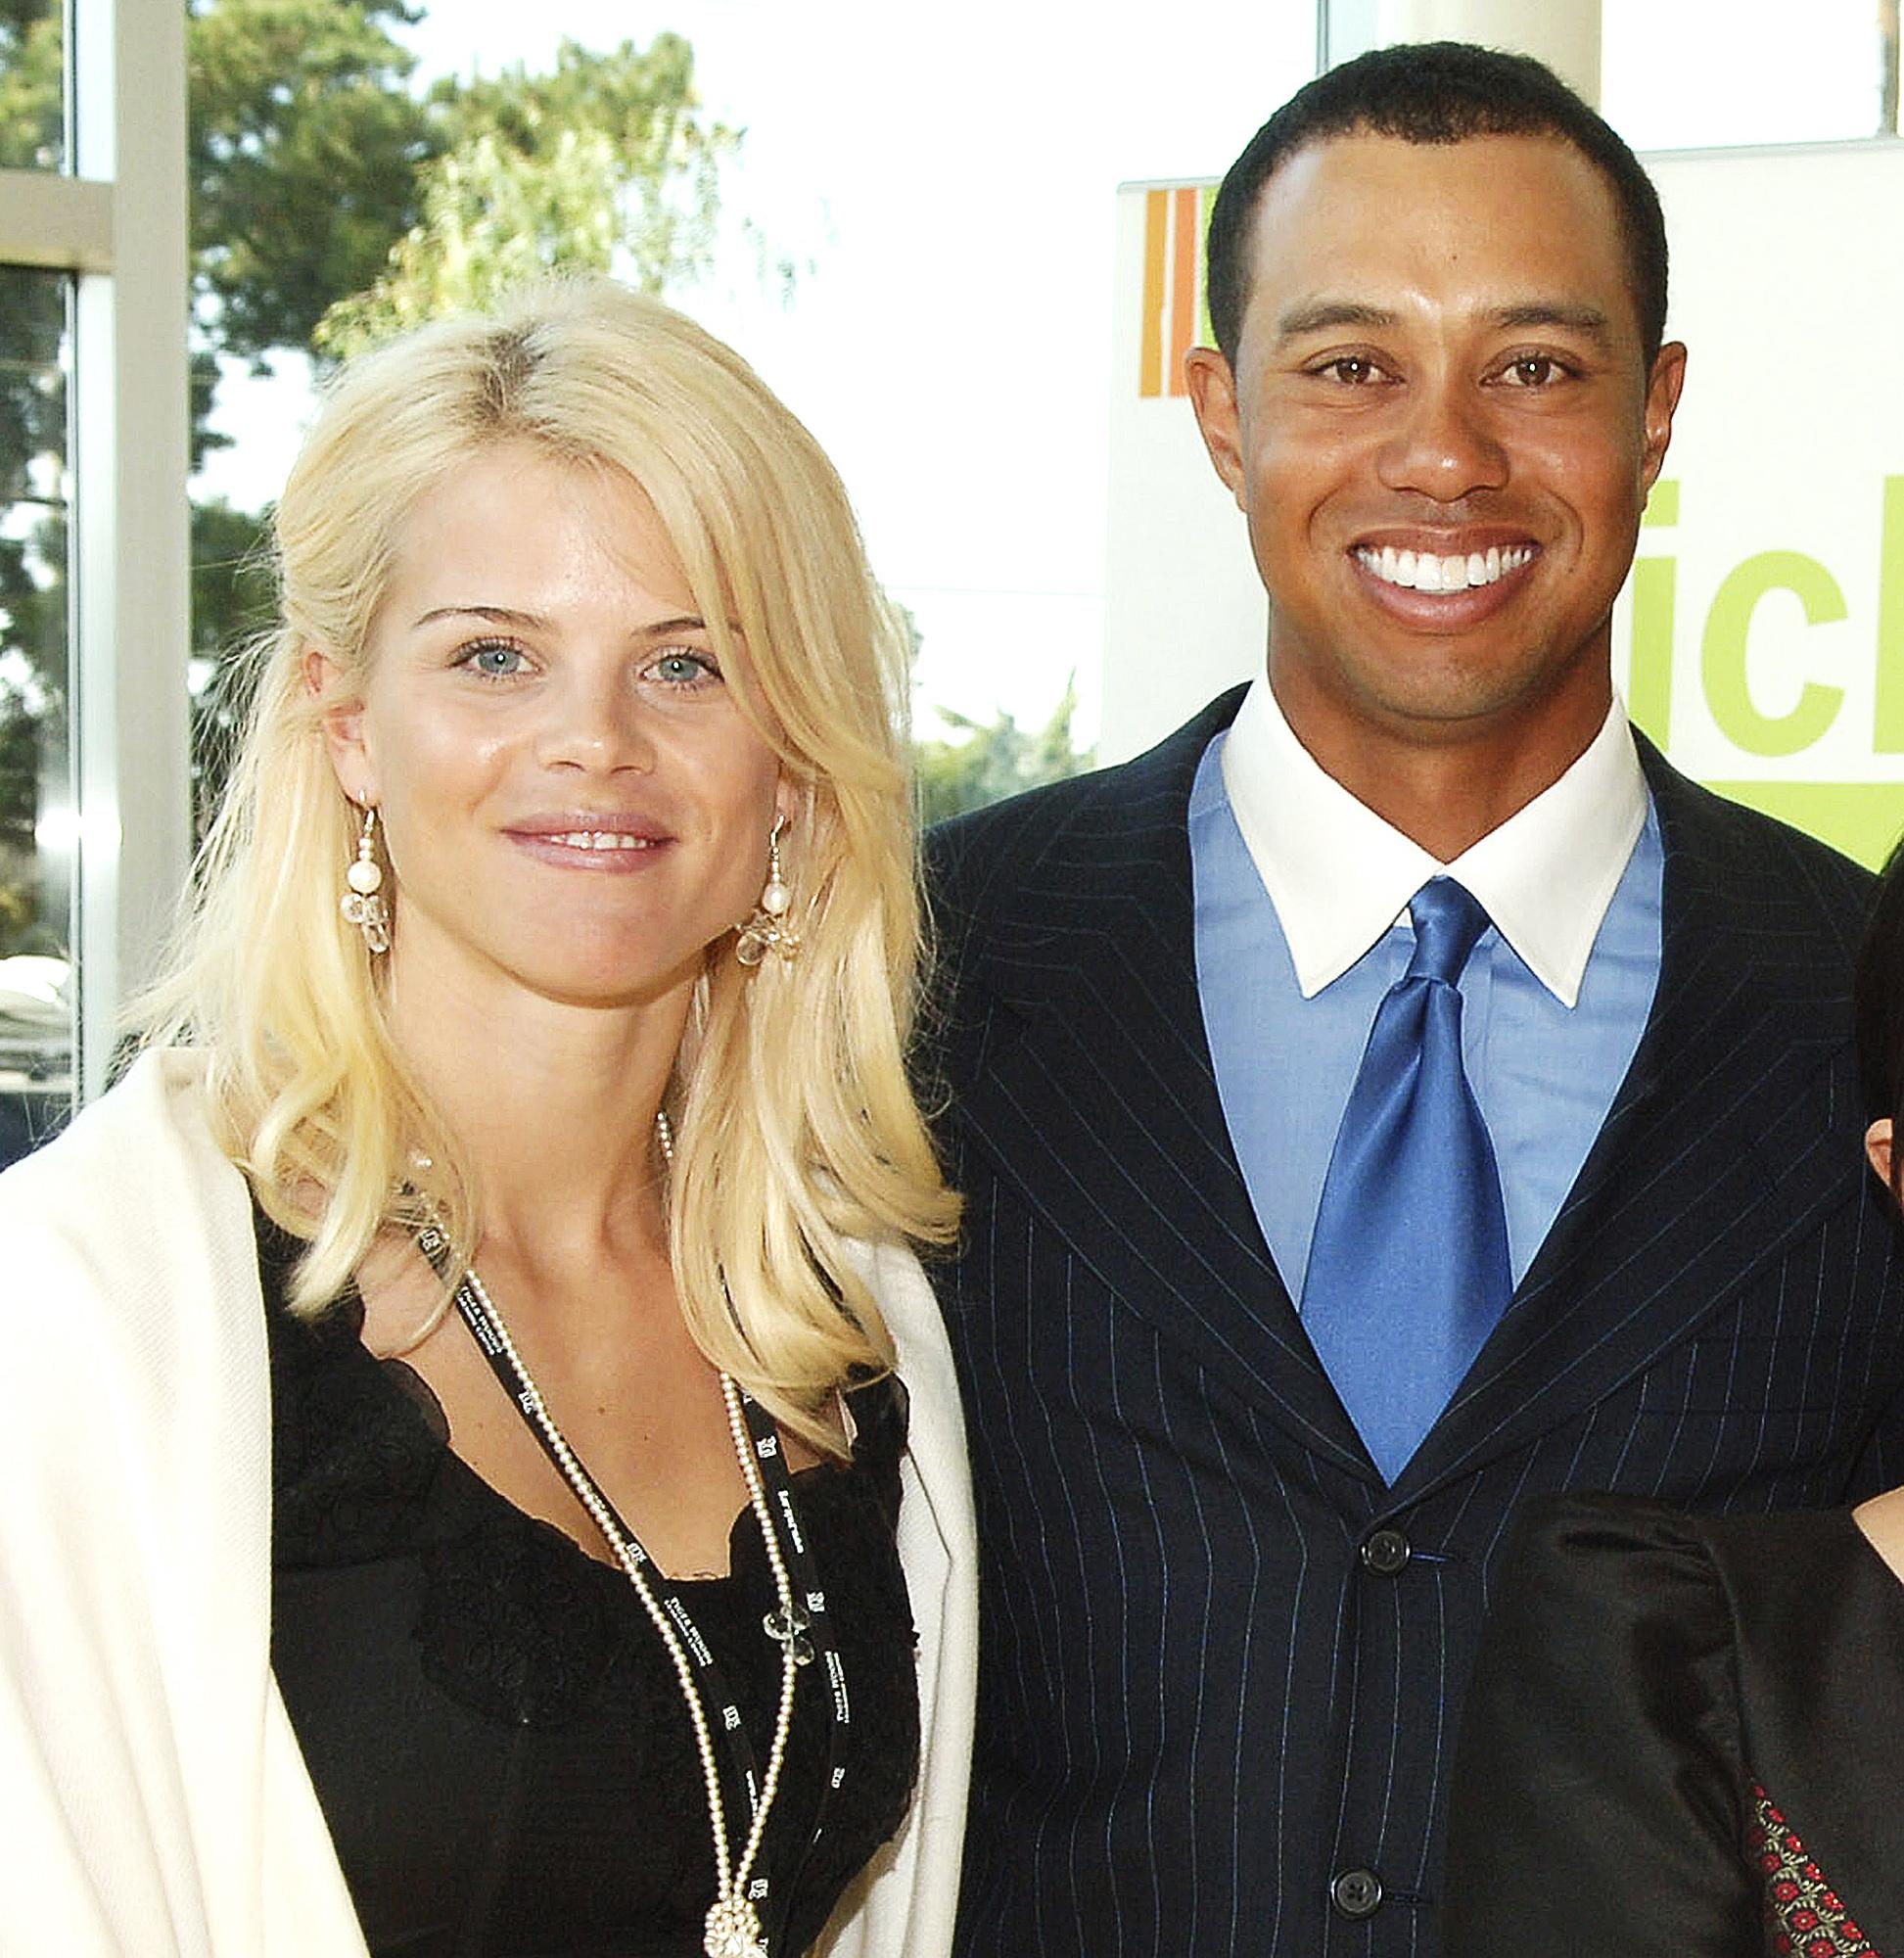 Tiger Woods Elin / Elin Nordegren And Tiger Woods Create